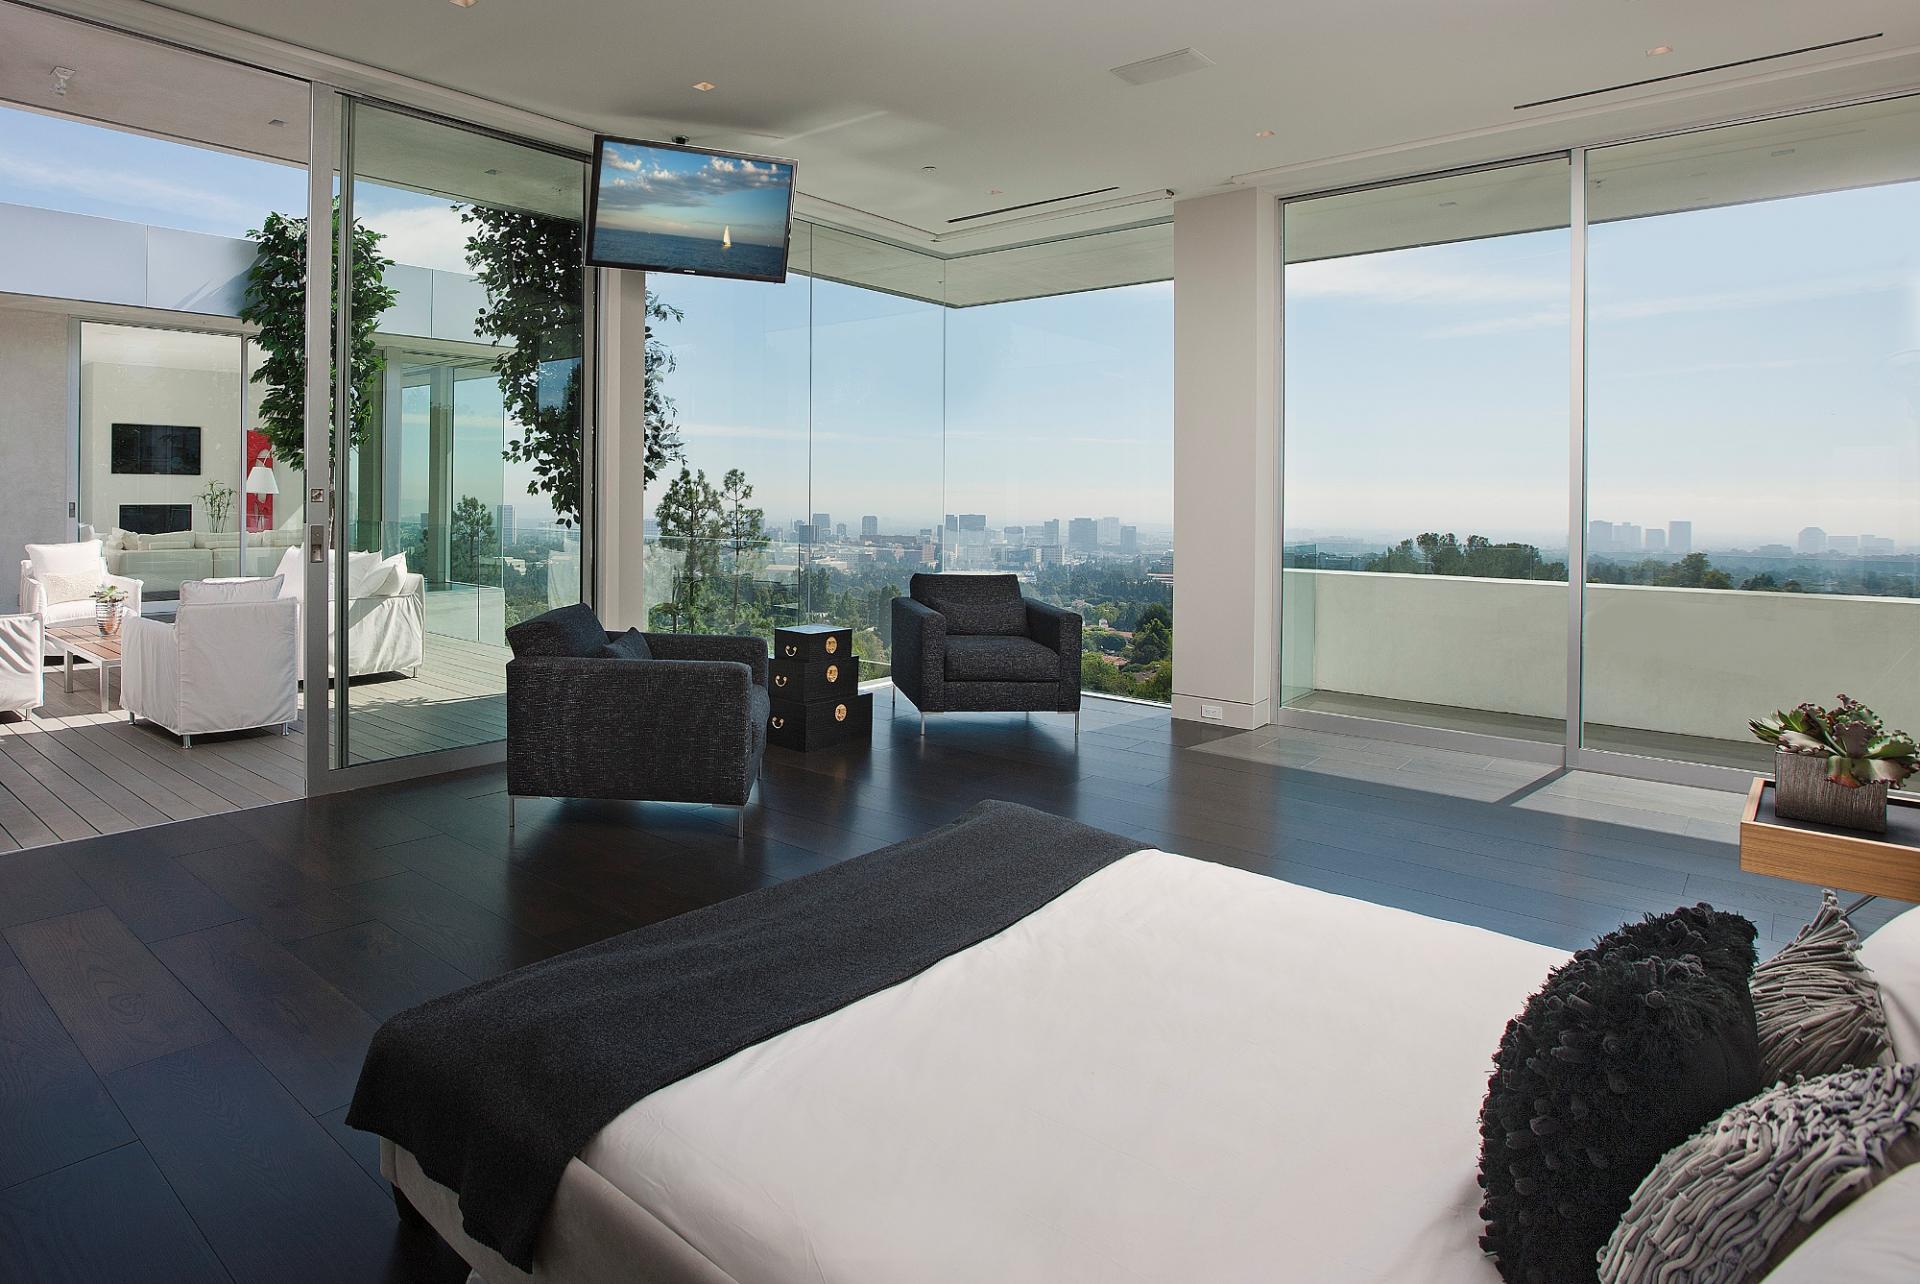 755-Sarbonne-13-0 Wood Paneled Room Design